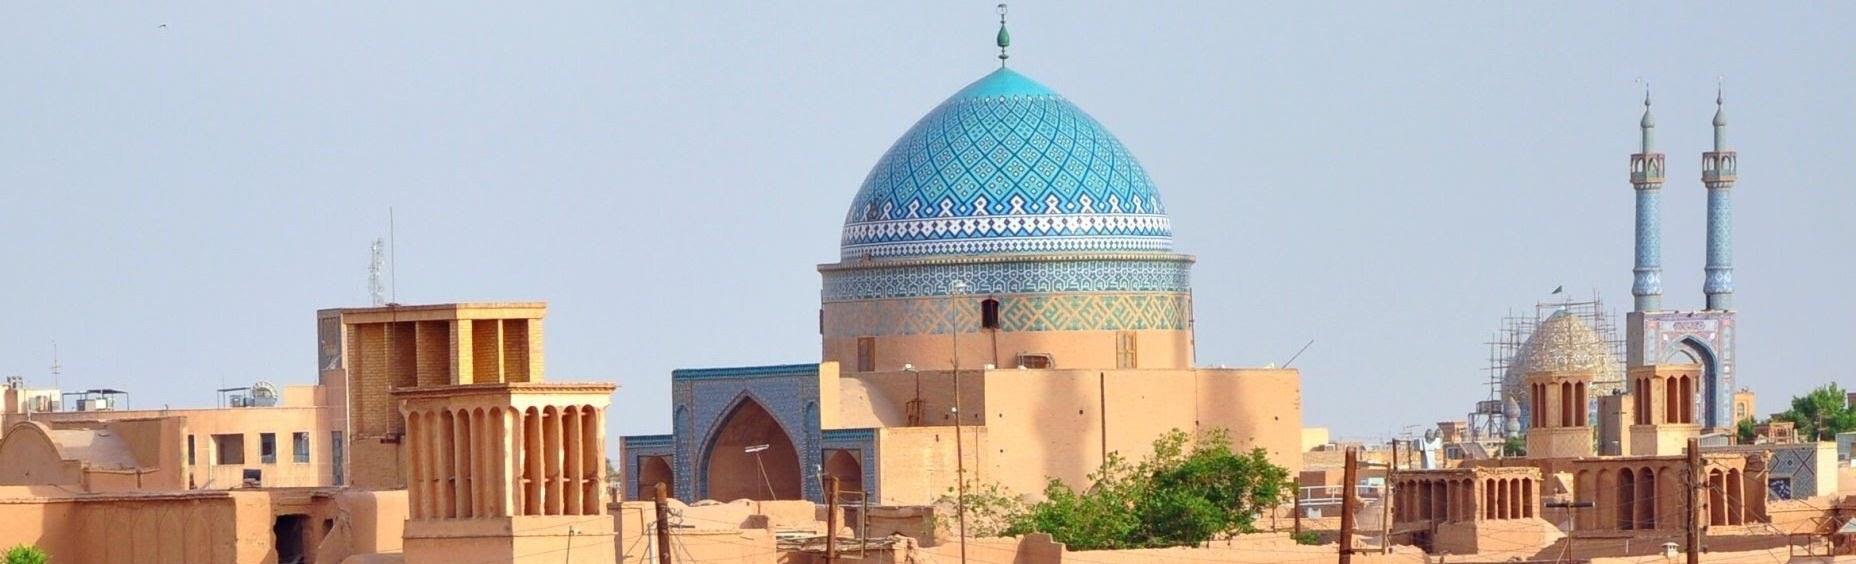 maxresdefault-2 Iran World Heritage Sites Uncategorized Iran World Heritage Sites Iran Culture